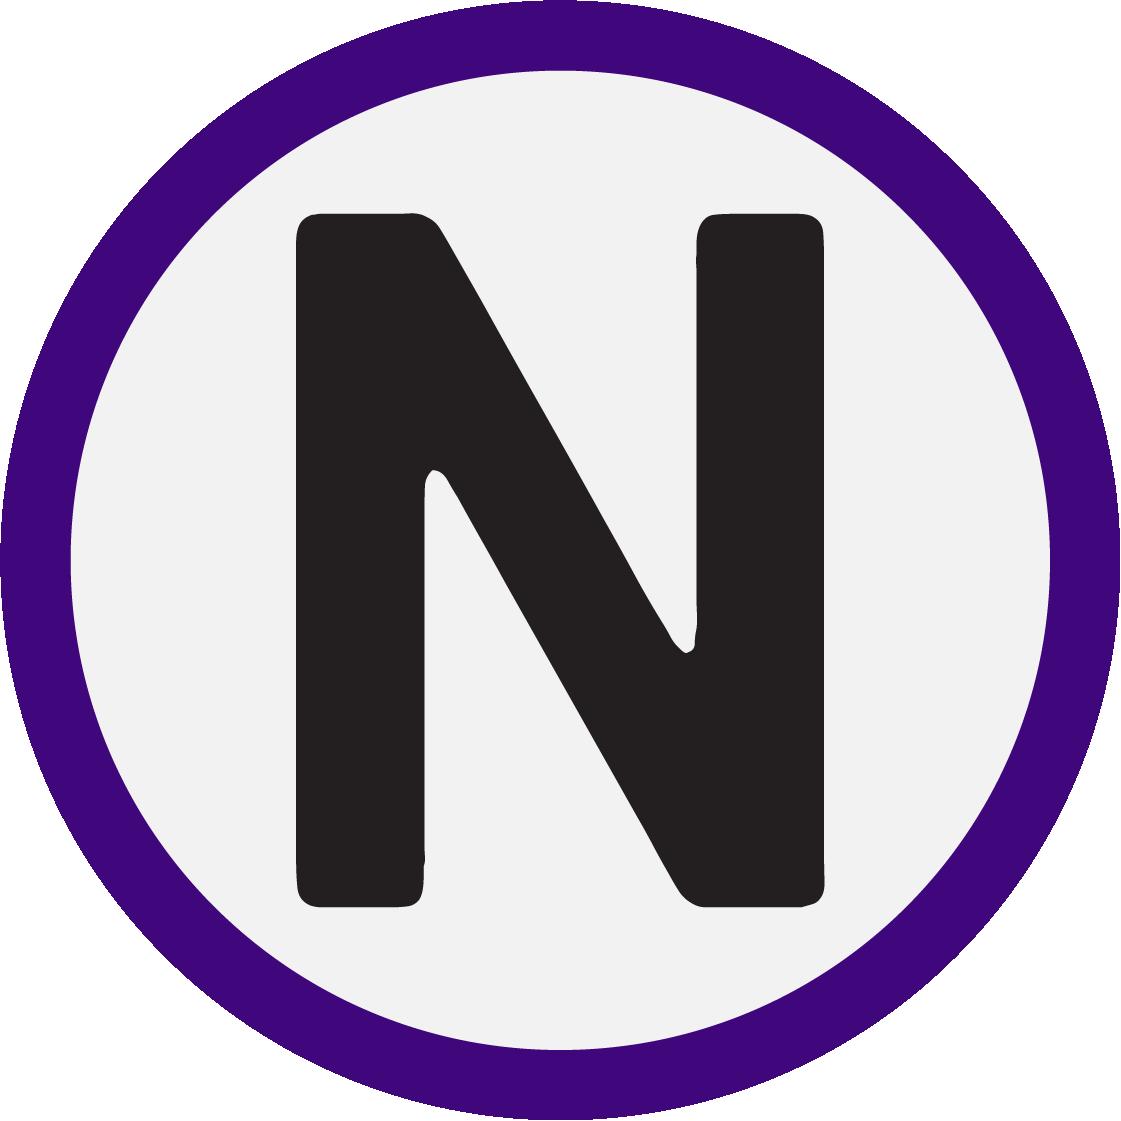 NAAHP_Simple_N_Square_Logo_PNG.png